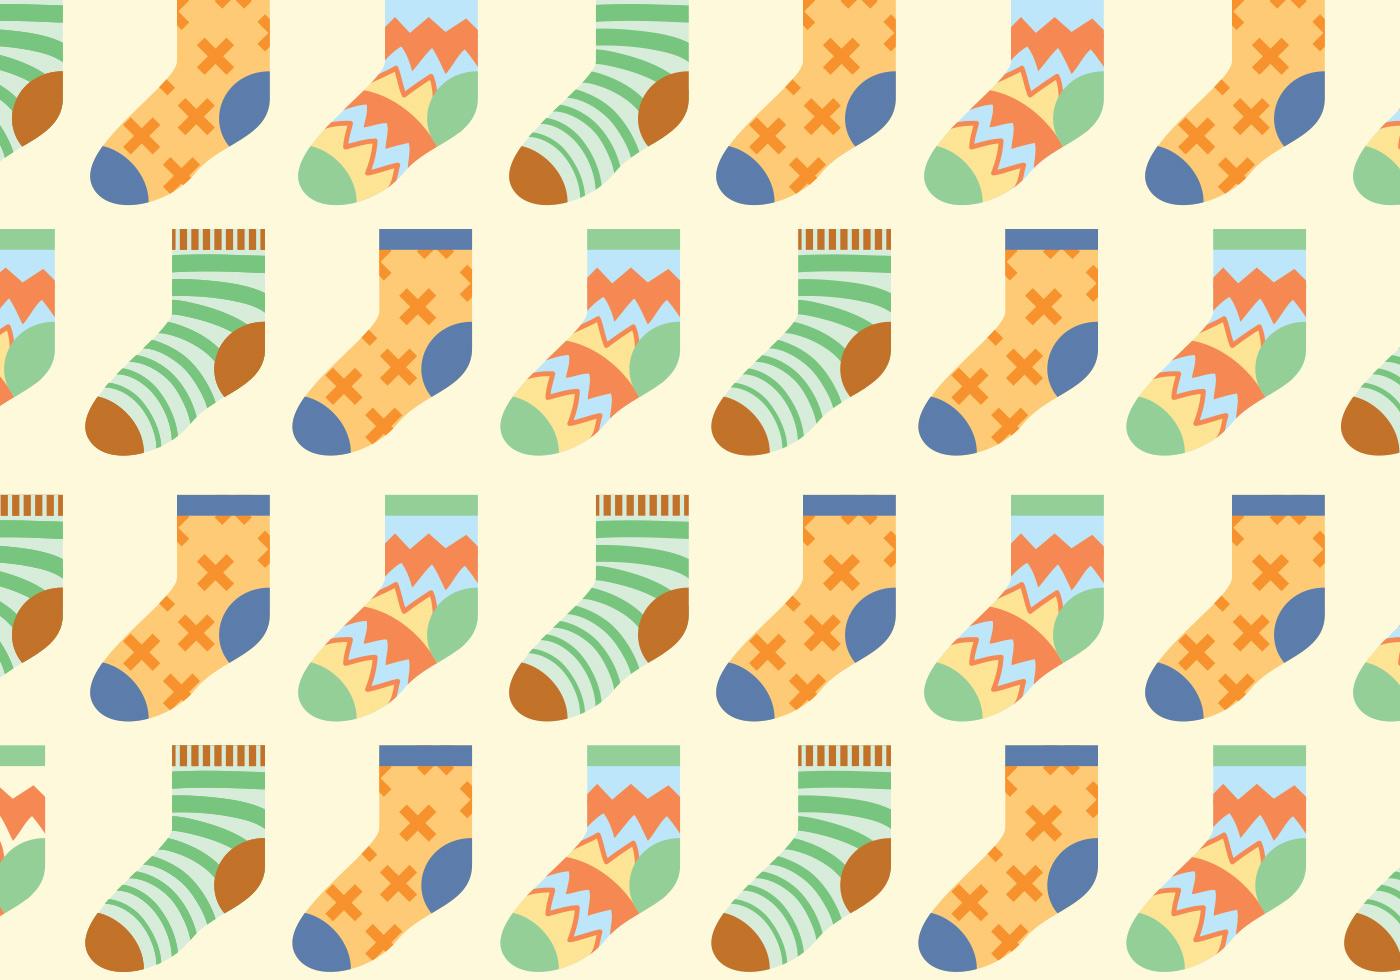 vector socks pattern download free vector art stock graphics images. Black Bedroom Furniture Sets. Home Design Ideas